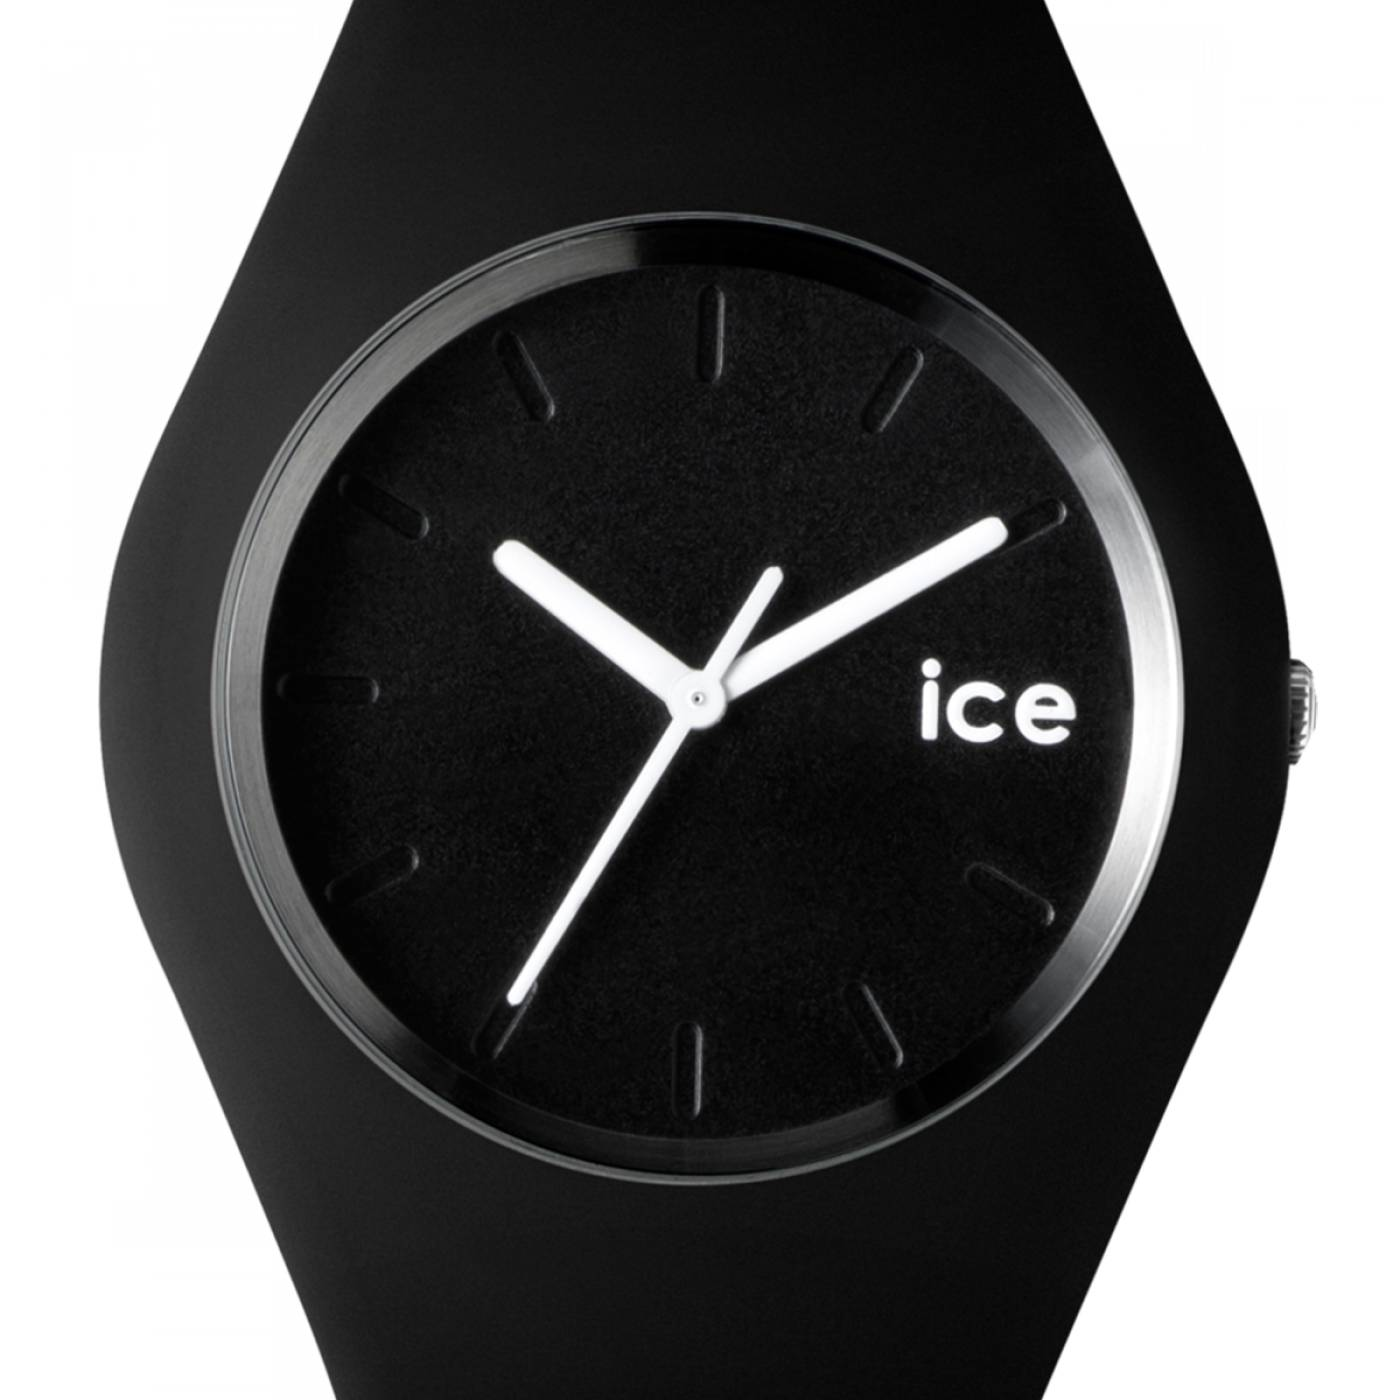 montre homme femme ice noir ice watch. Black Bedroom Furniture Sets. Home Design Ideas